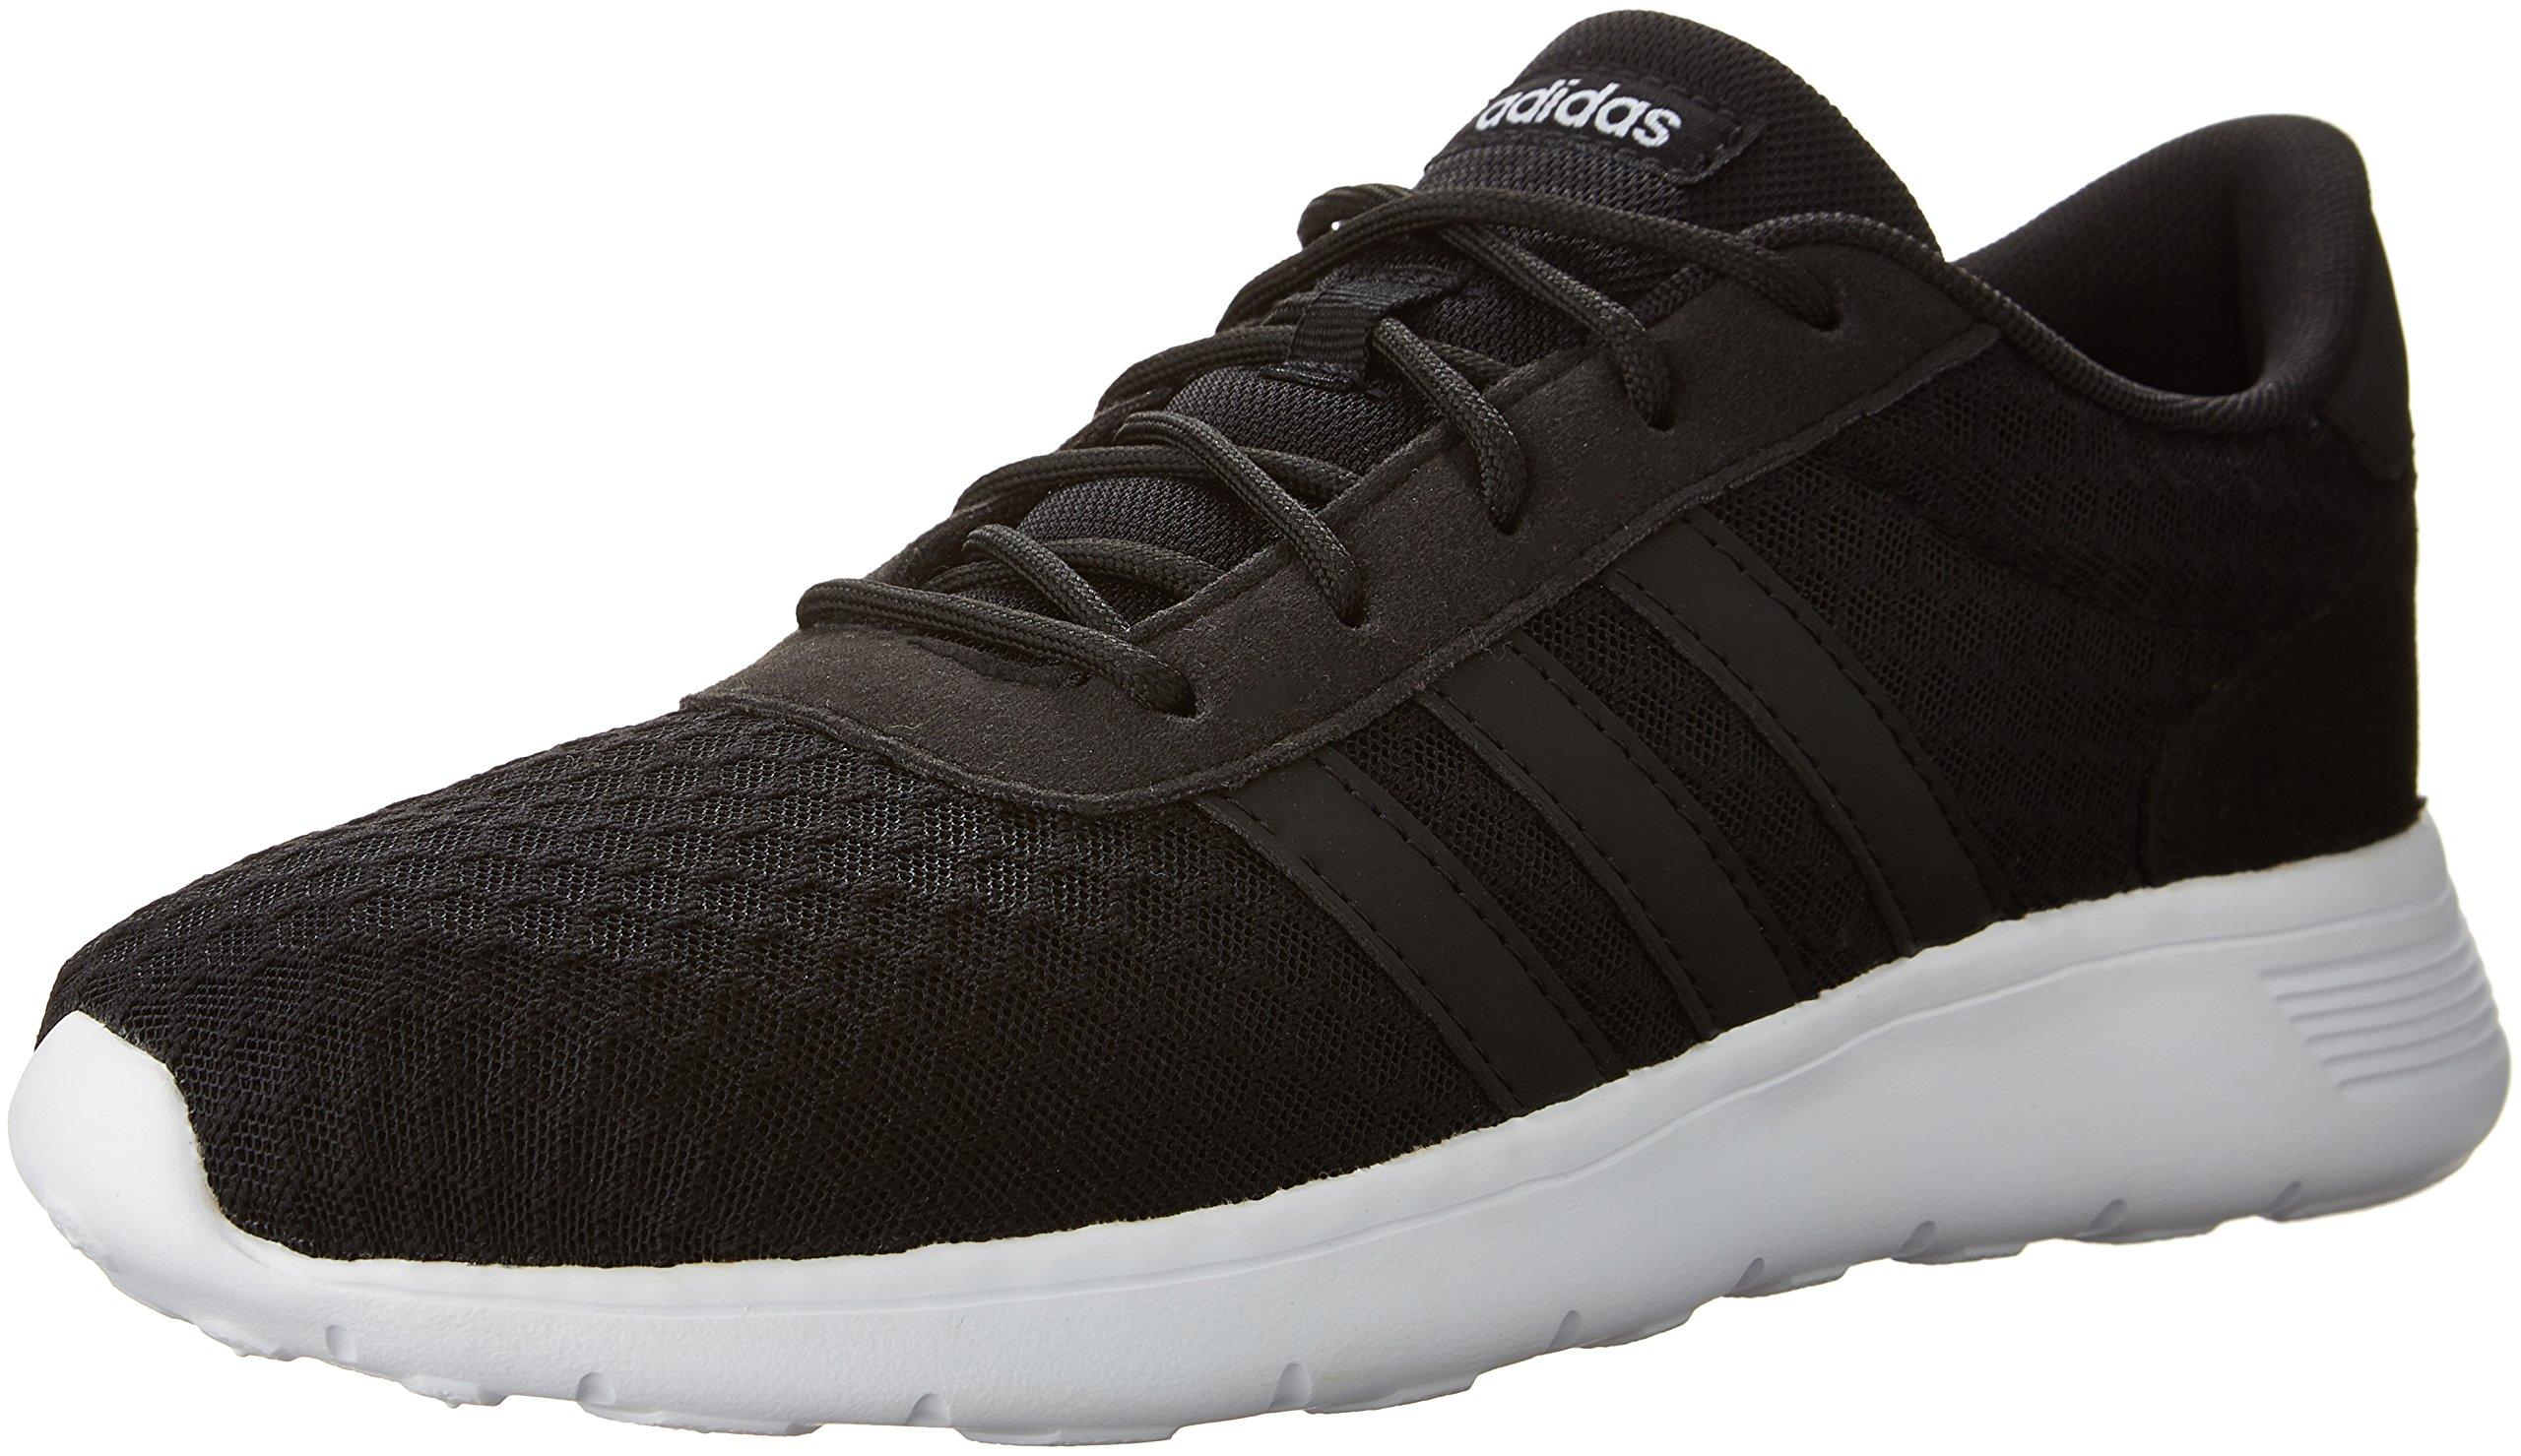 adidas Women's Lite Racer W Sneaker, Black/White, 8.5 M US by adidas (Image #1)